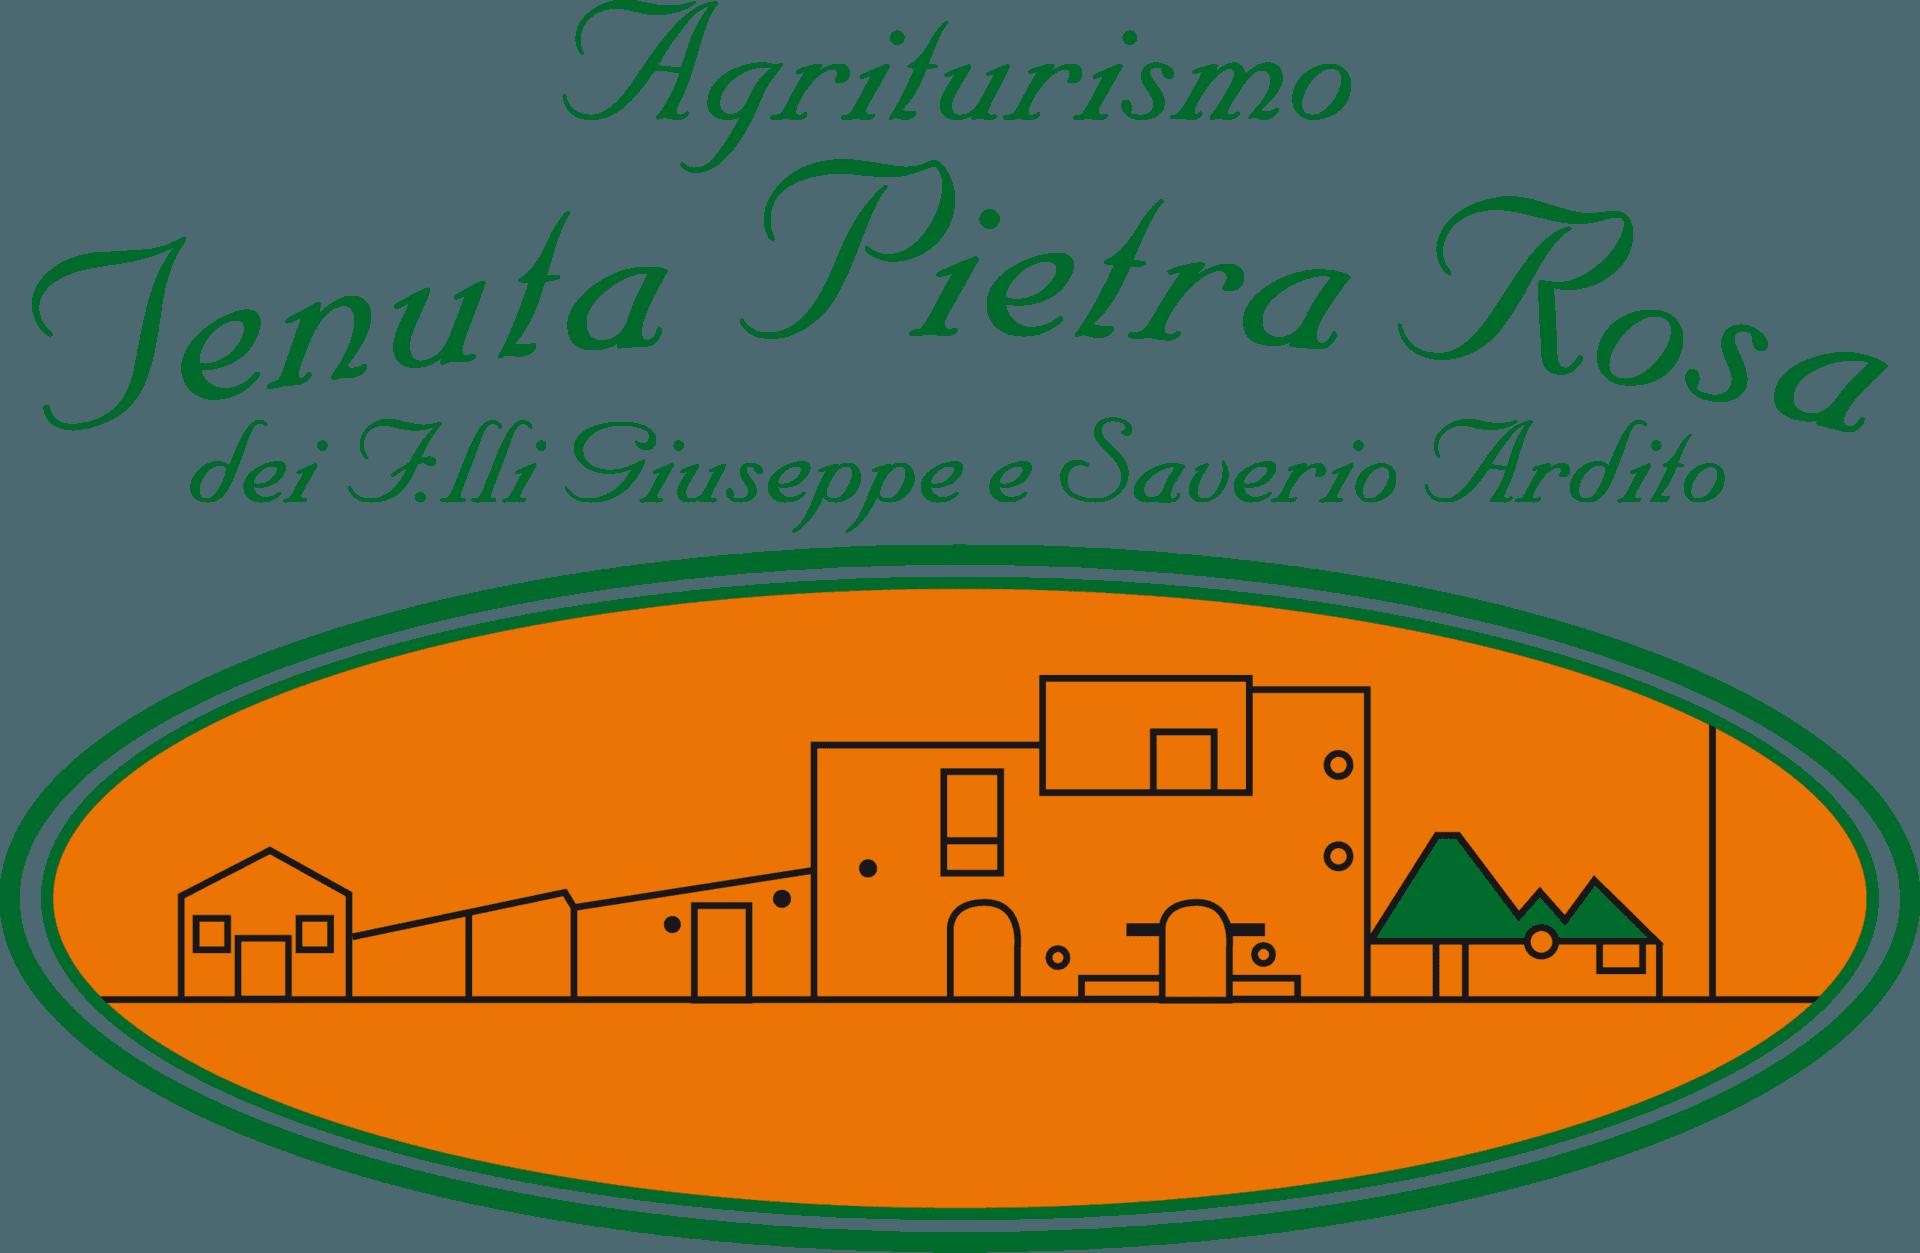 AGRITURISMO TENUTA PIETRA ROSA - LOGO